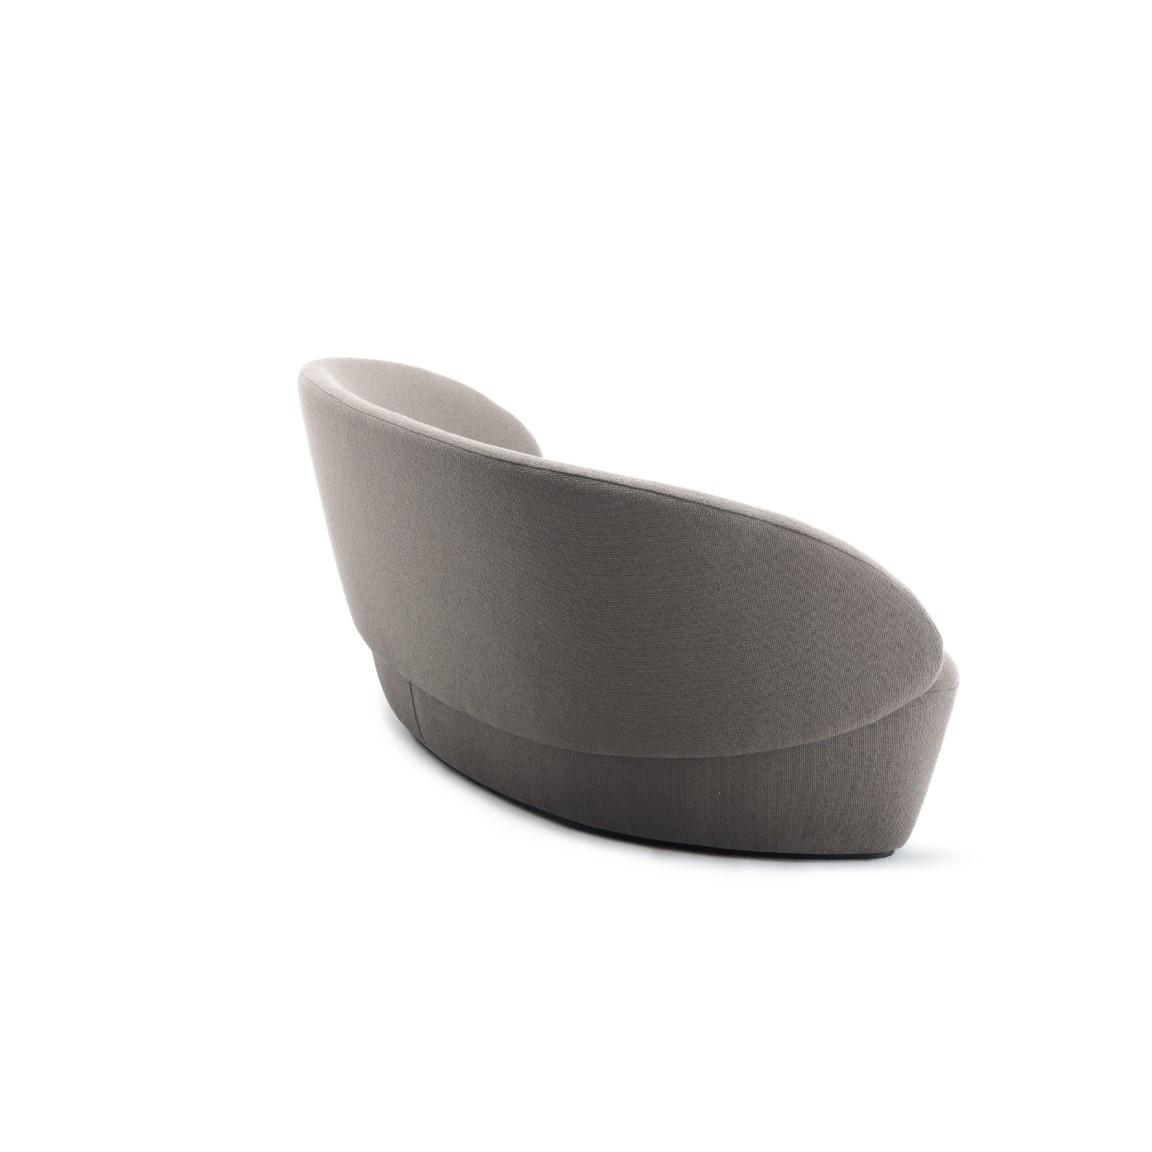 3-Sitzer Sofa Naïve | Beige